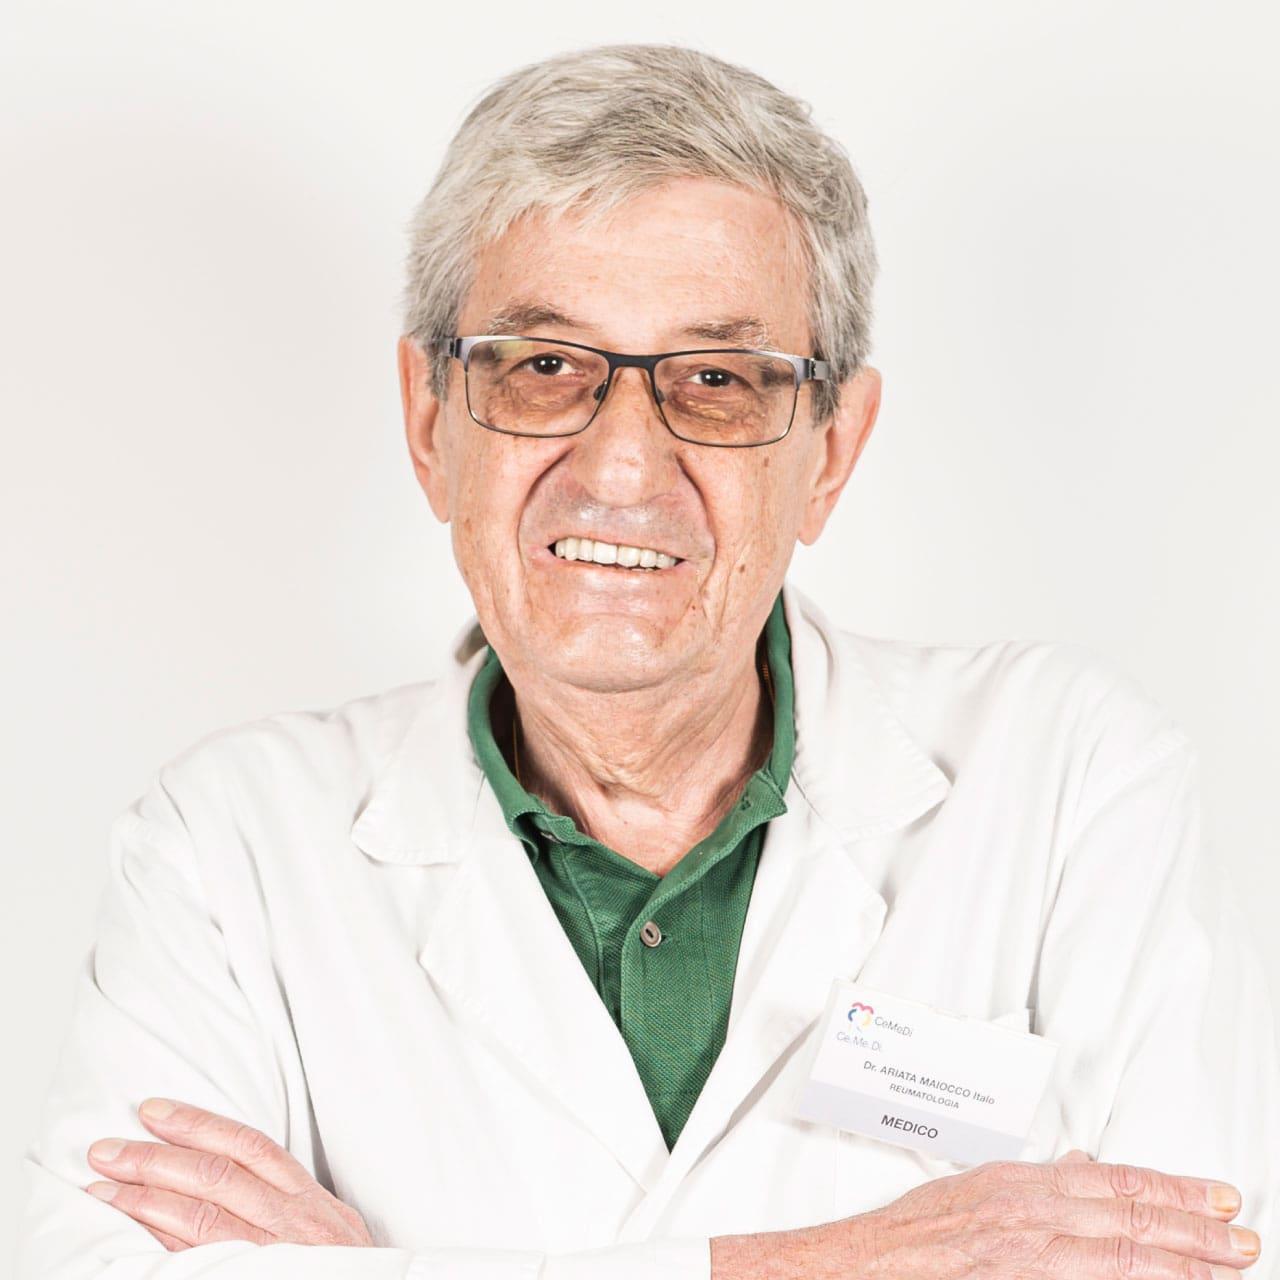 Ariata Maiocco Dott. Italo